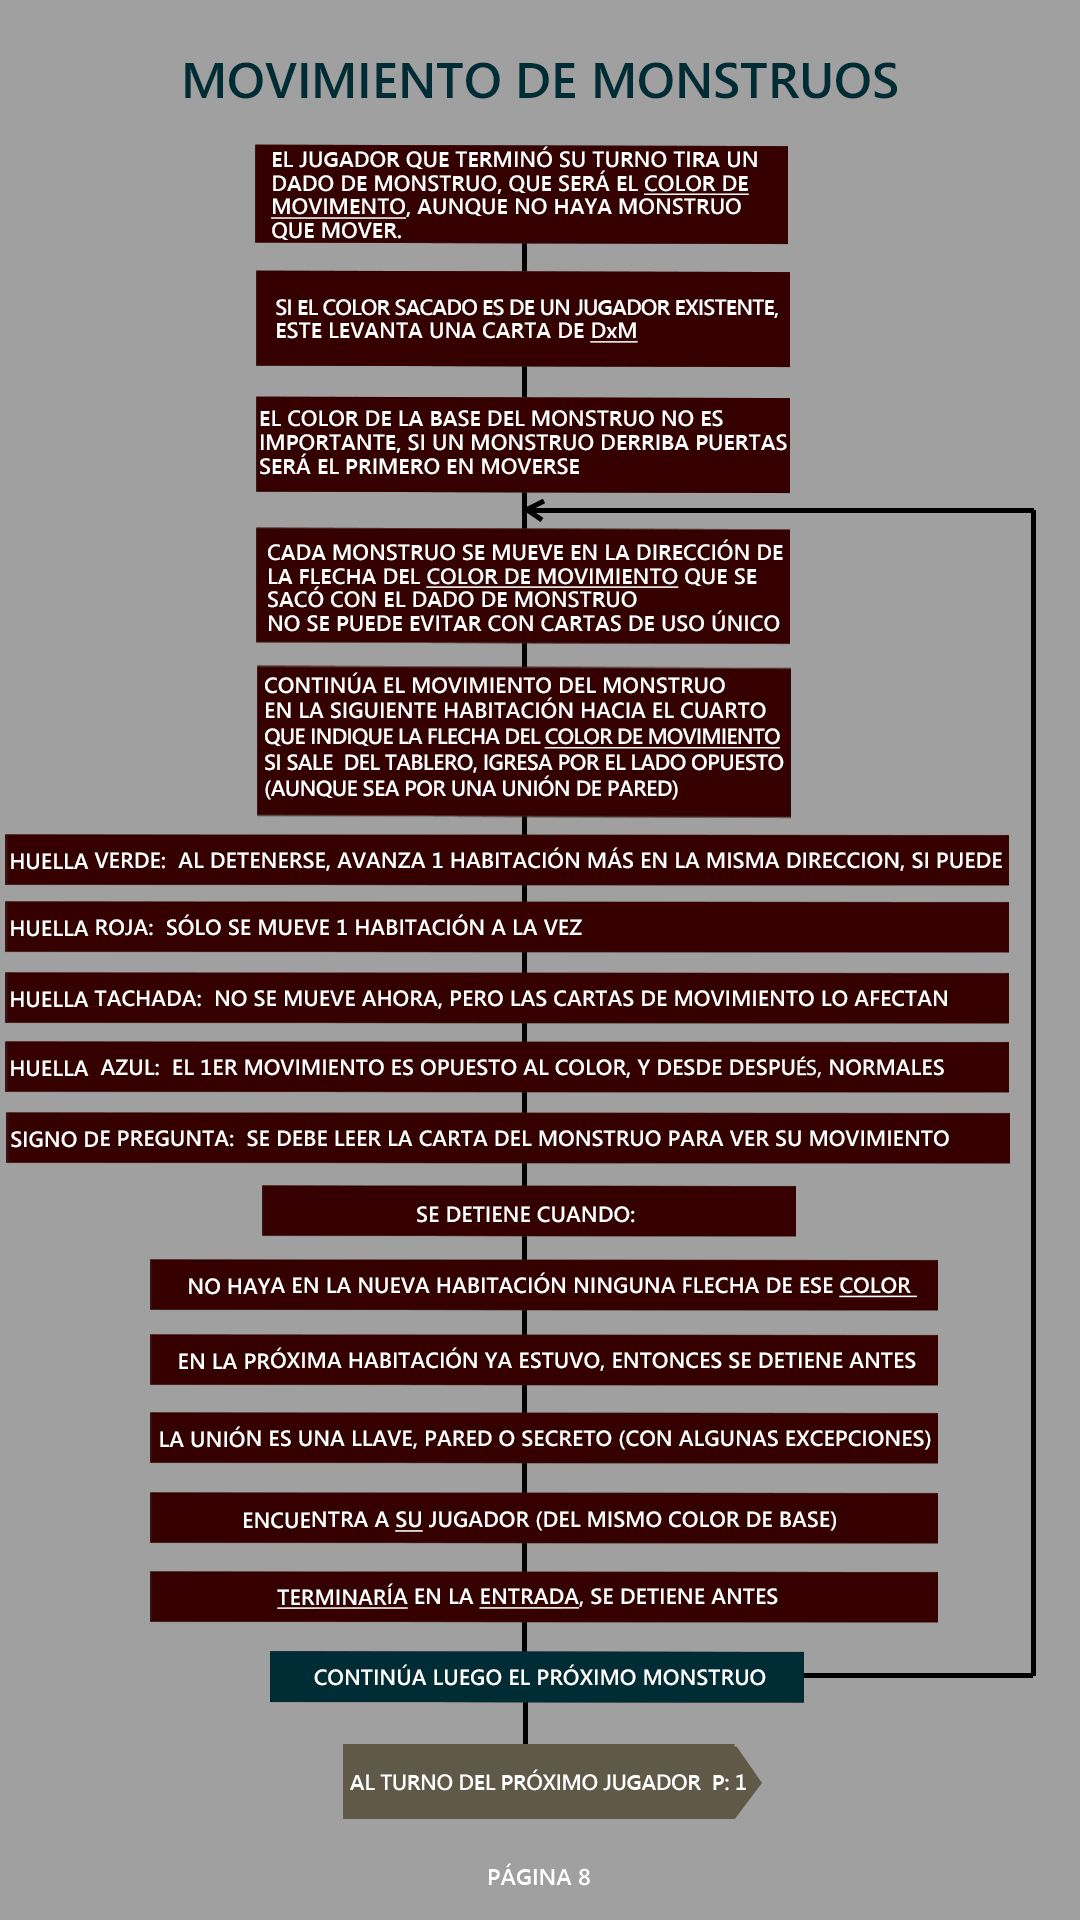 munchkin quest reglas hoja 7 | munchkin quest reglas | Pinterest